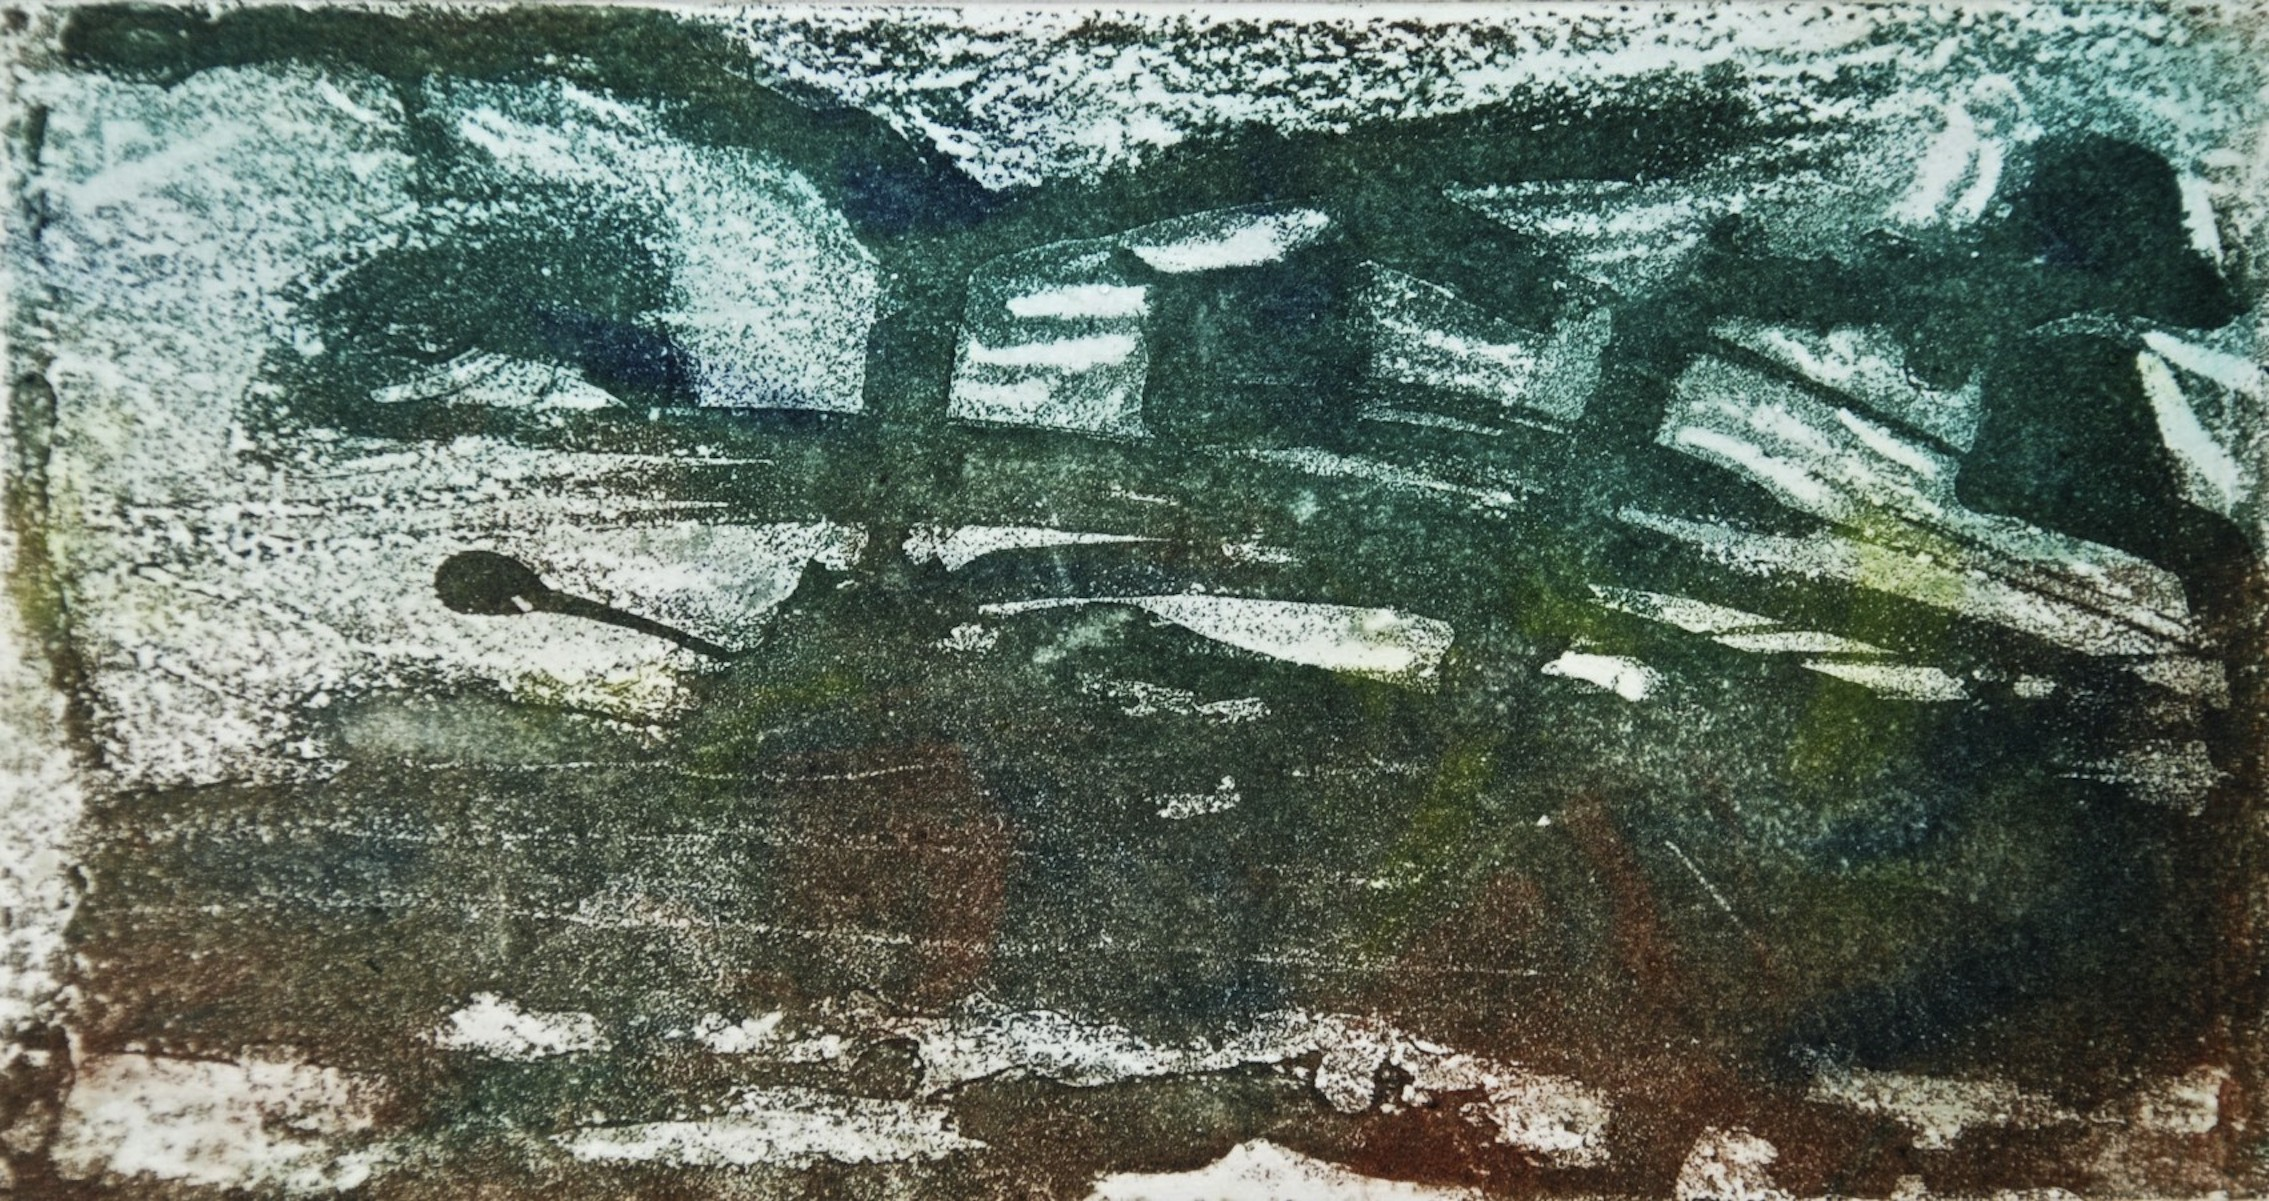 Abstract 1, aquatin, 7 x 12.6 cm, v:p, edition of 20